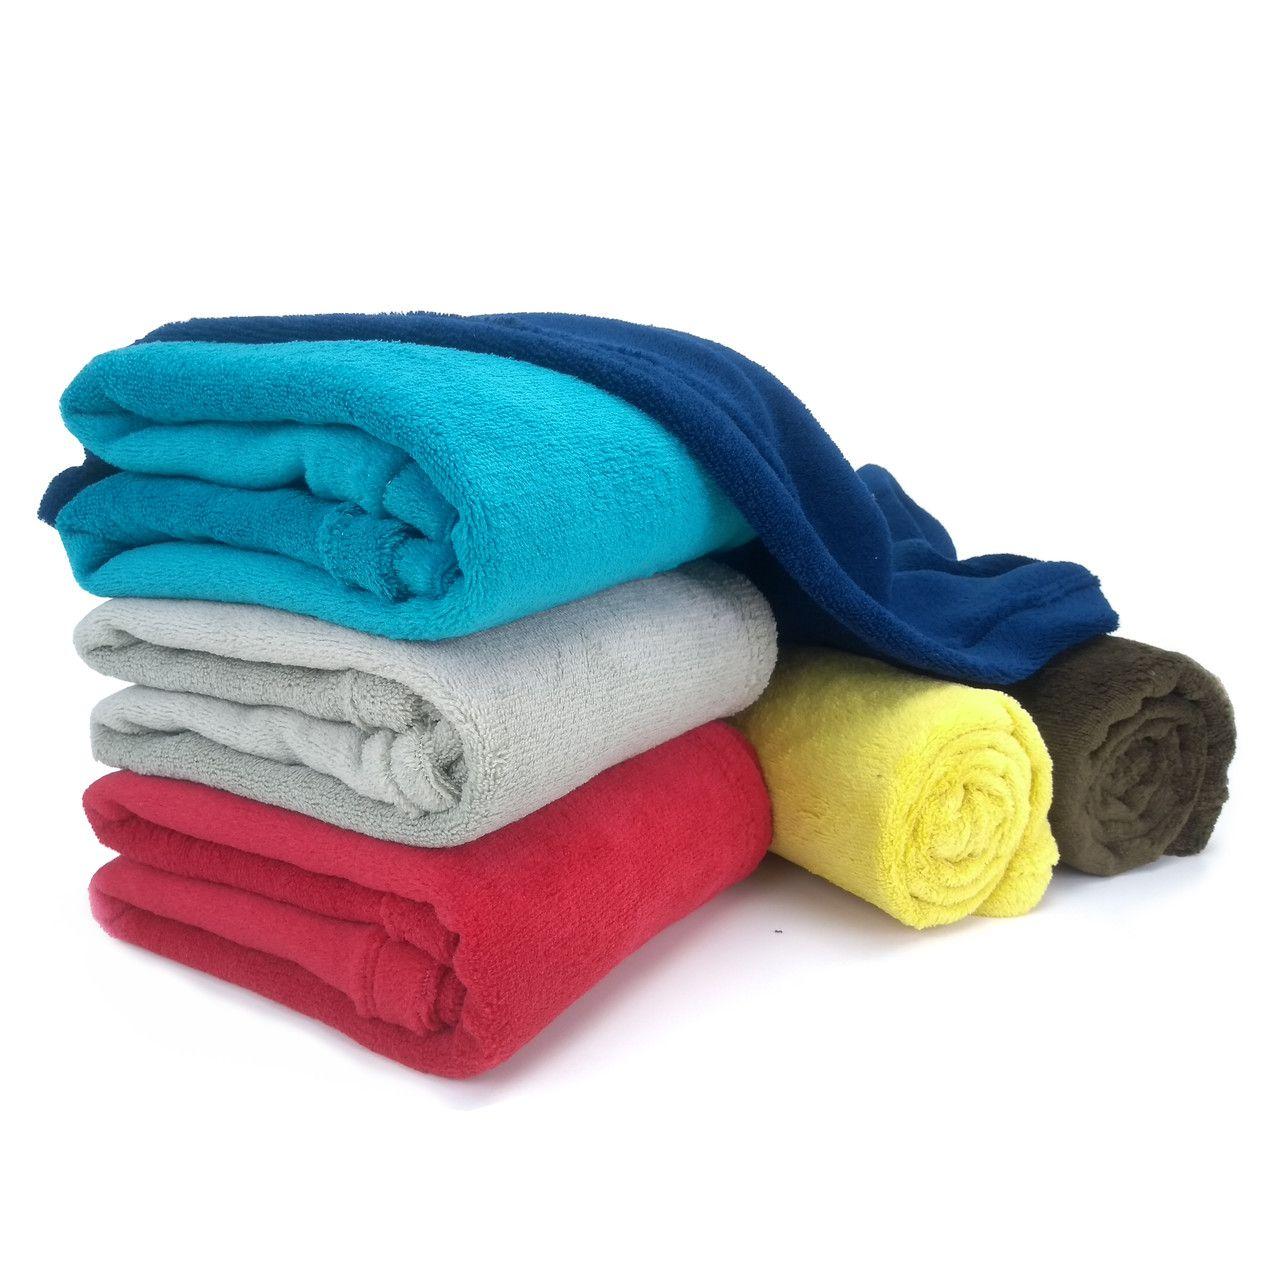 Manta Cobertor Bebe Flannel Berço Infantil Microfibra Macio